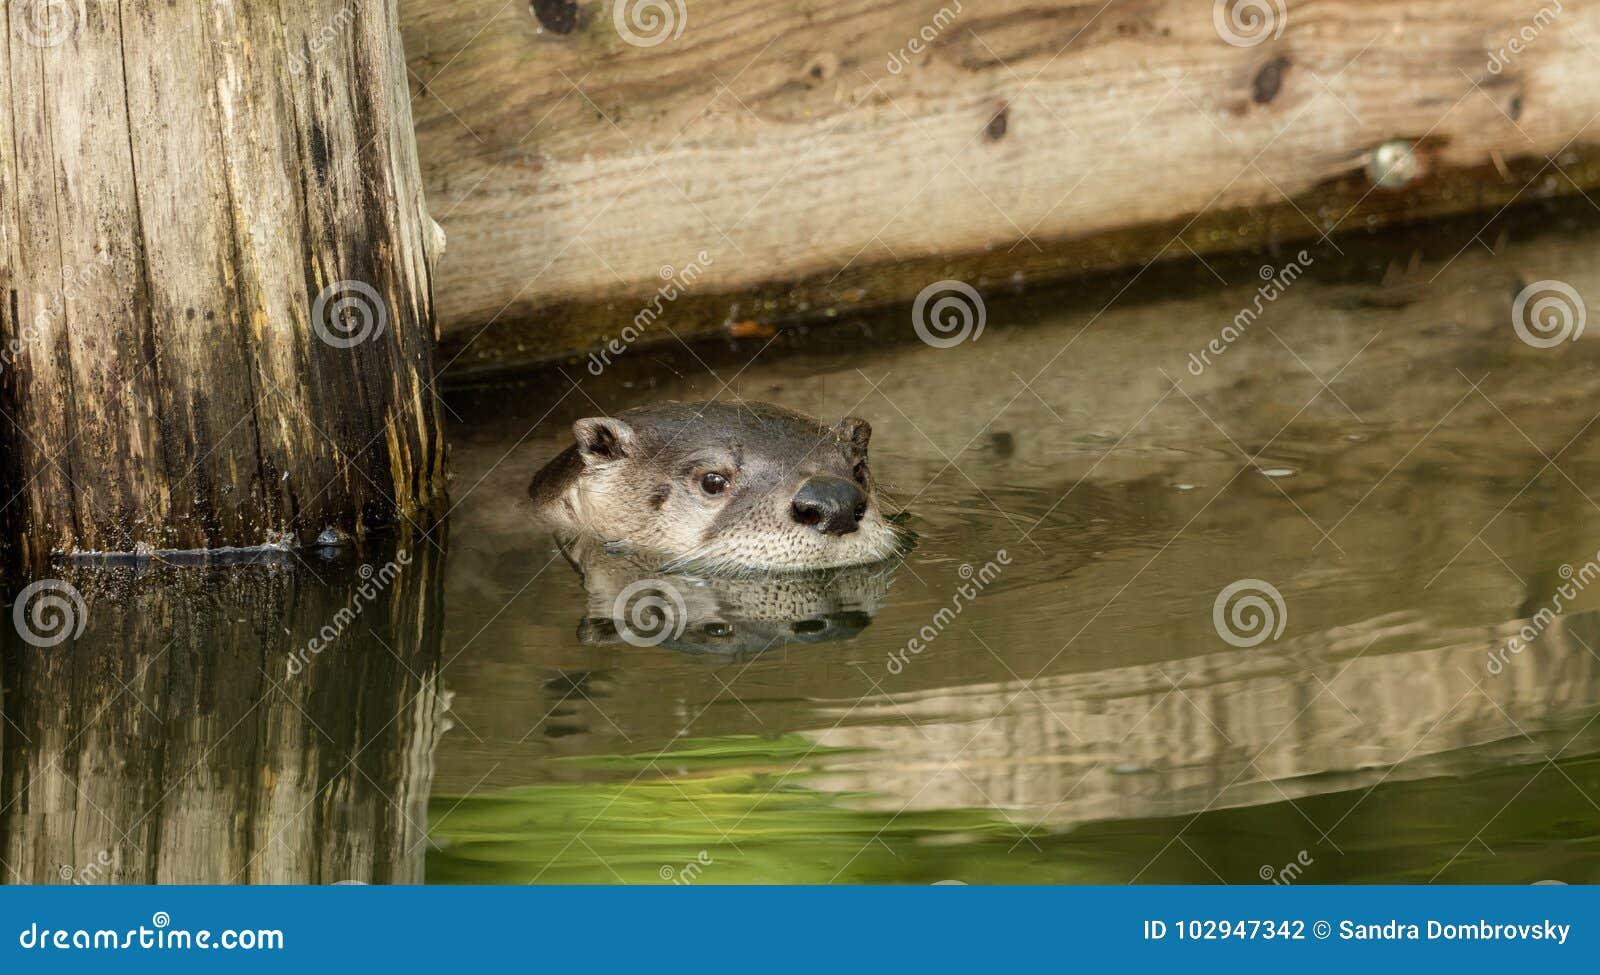 Otter in de vijver